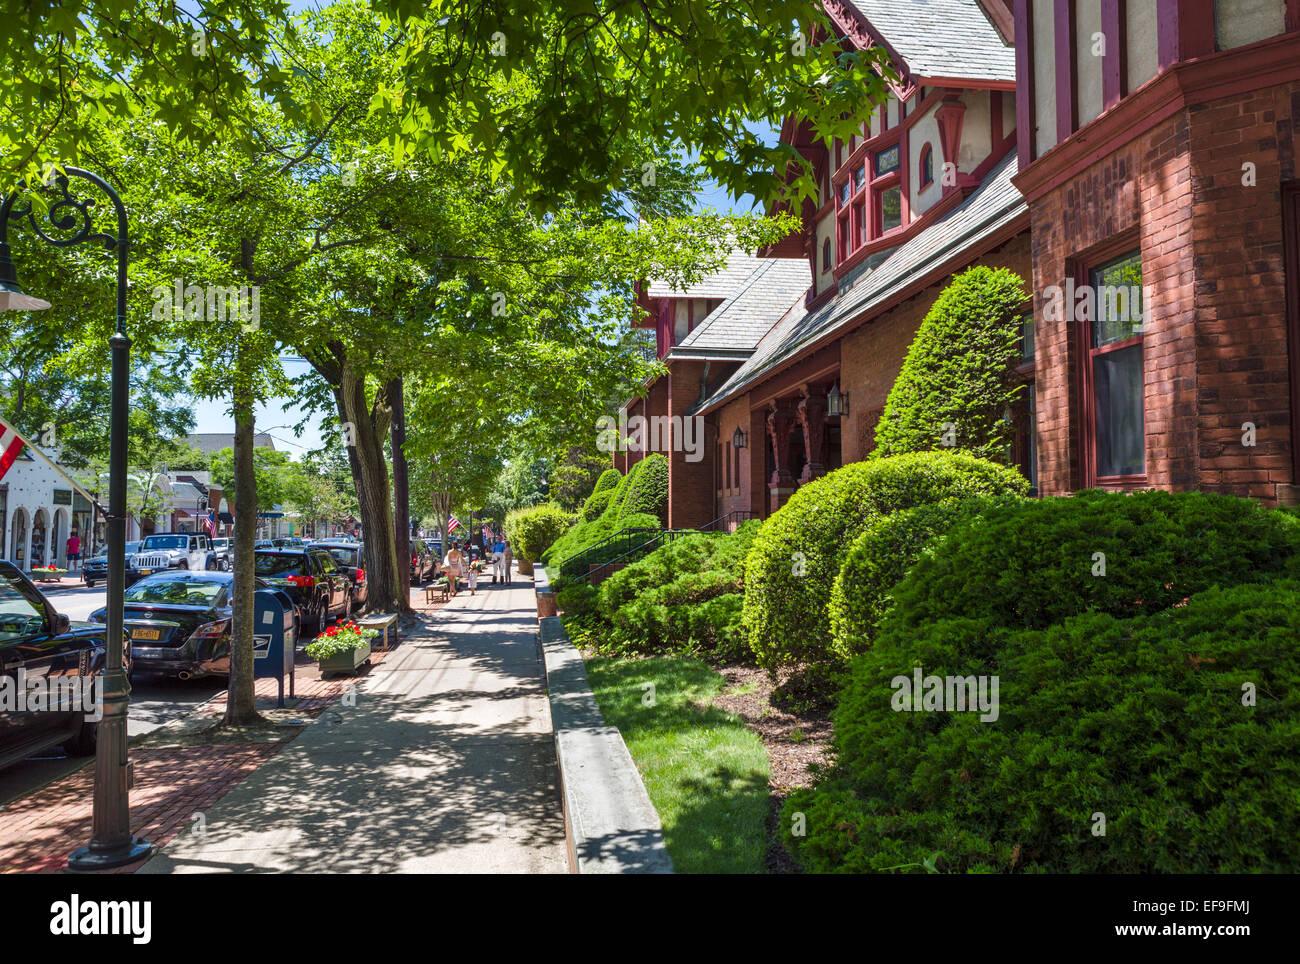 Jobs Lane In The Village Of Southampton Suffolk County Long Island